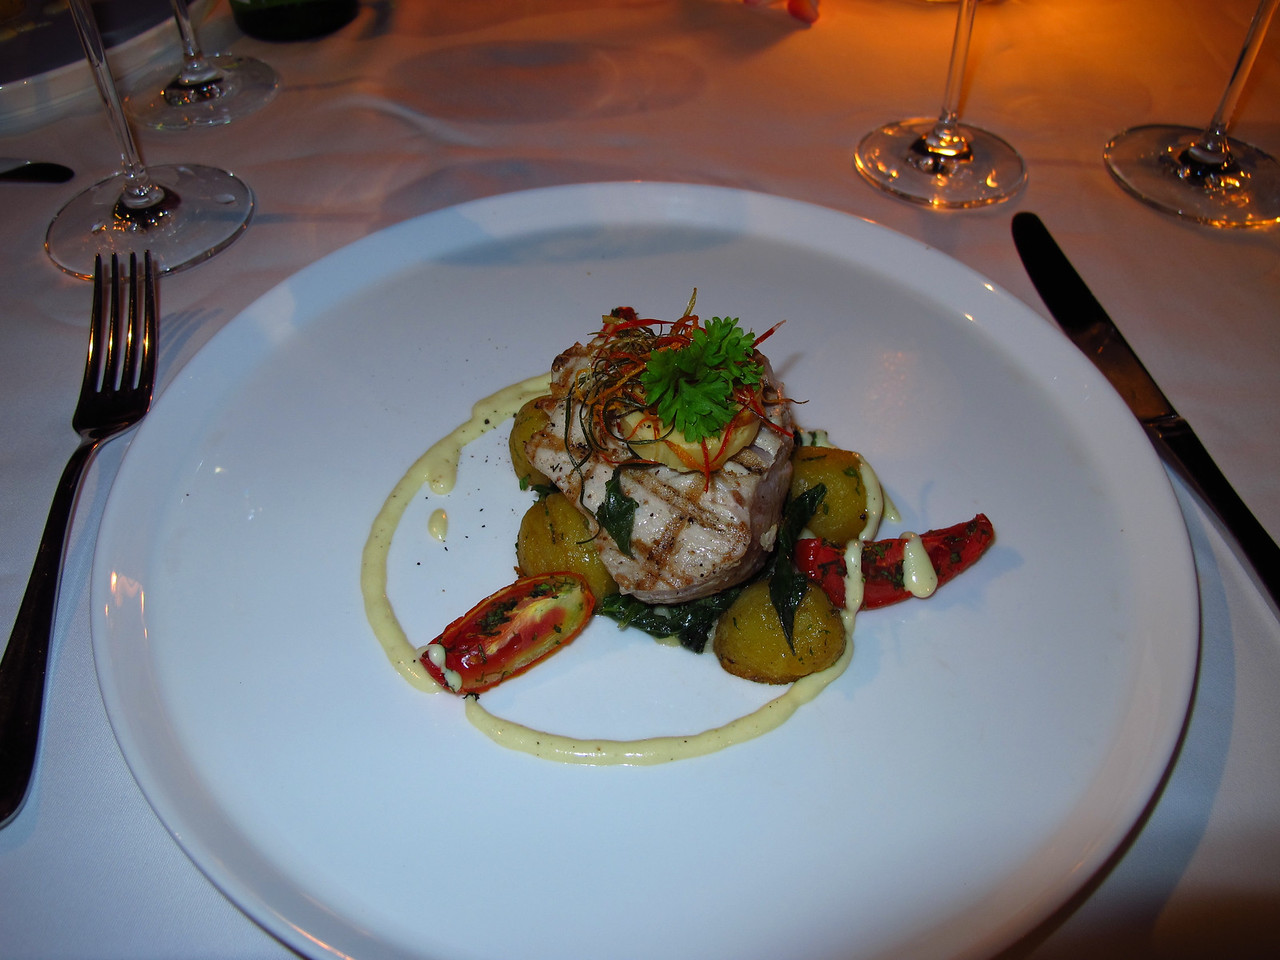 ..fresh tuna steak over potatoes...